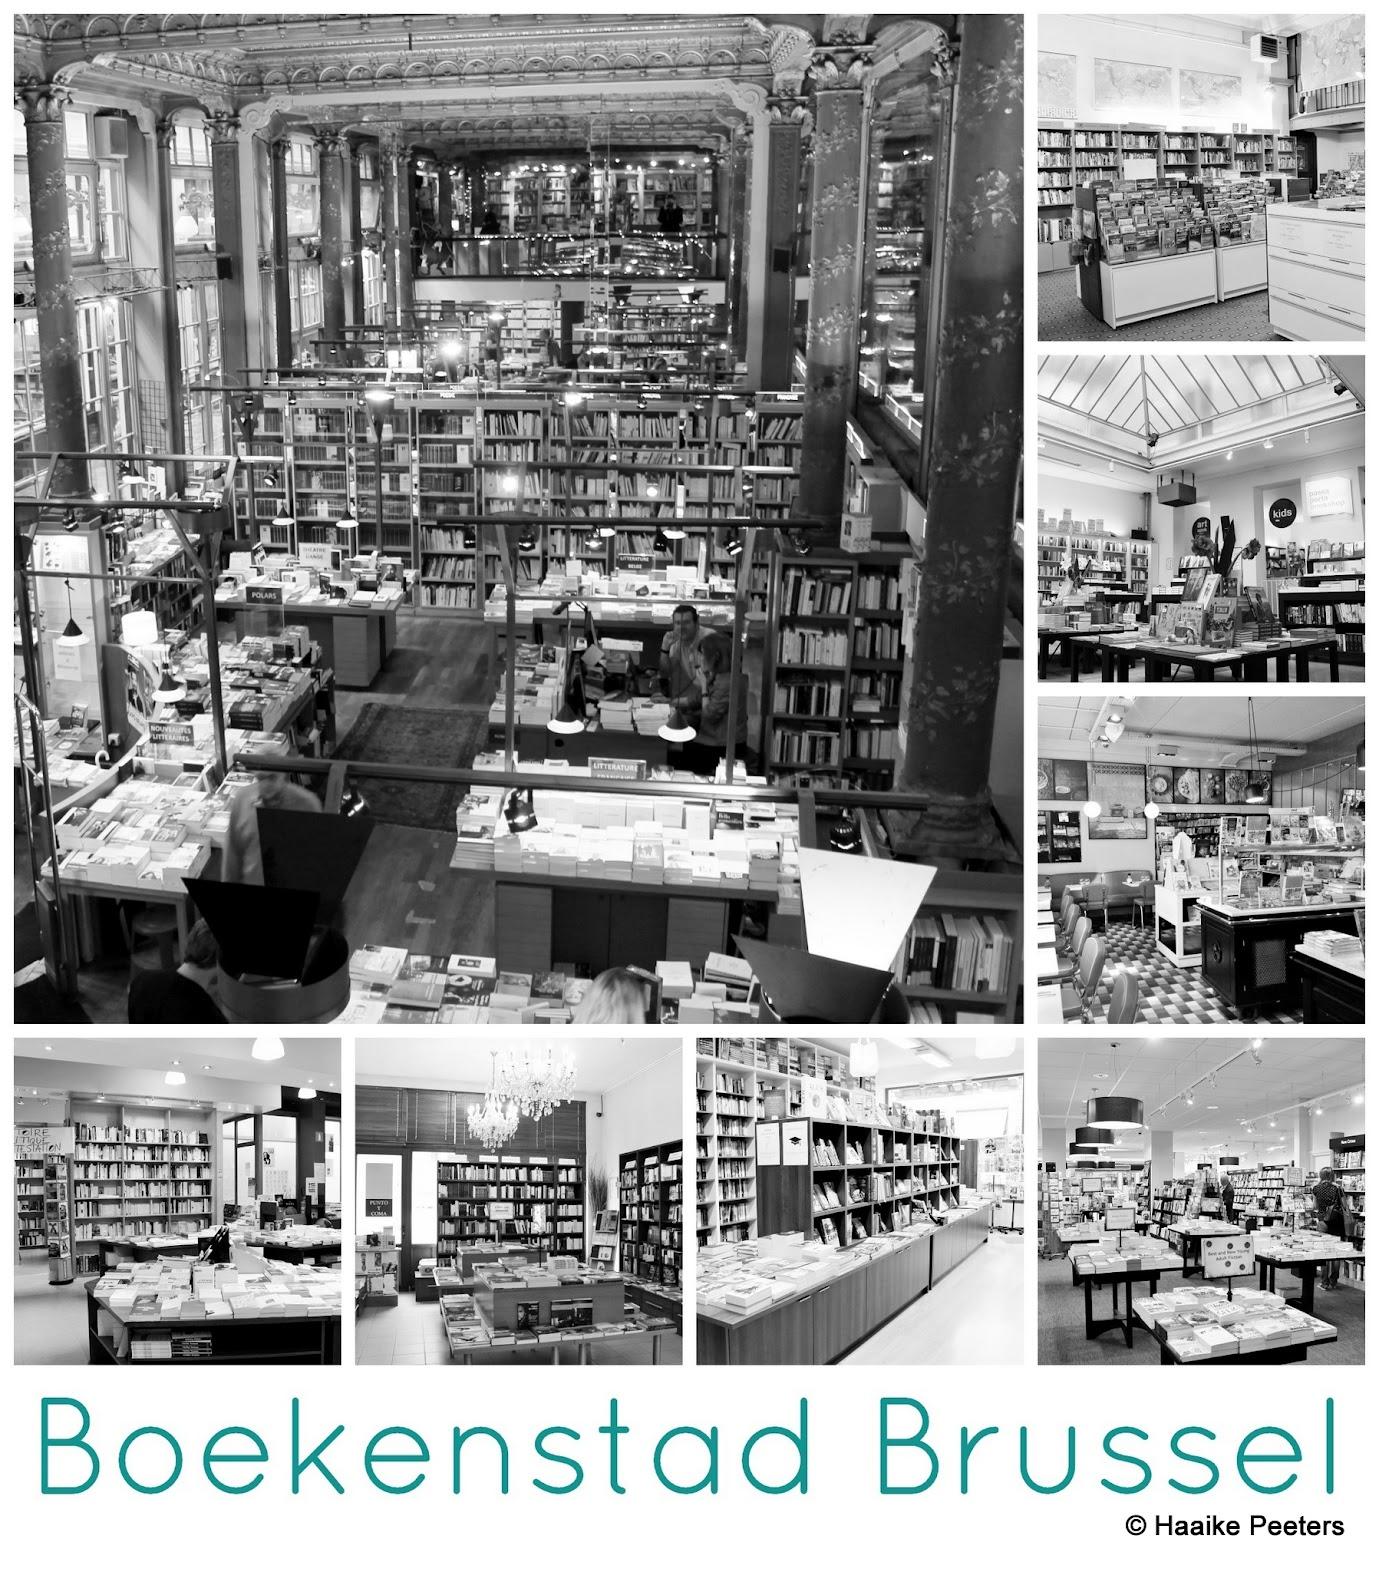 Boekenstad Brussel (Le petit requin)